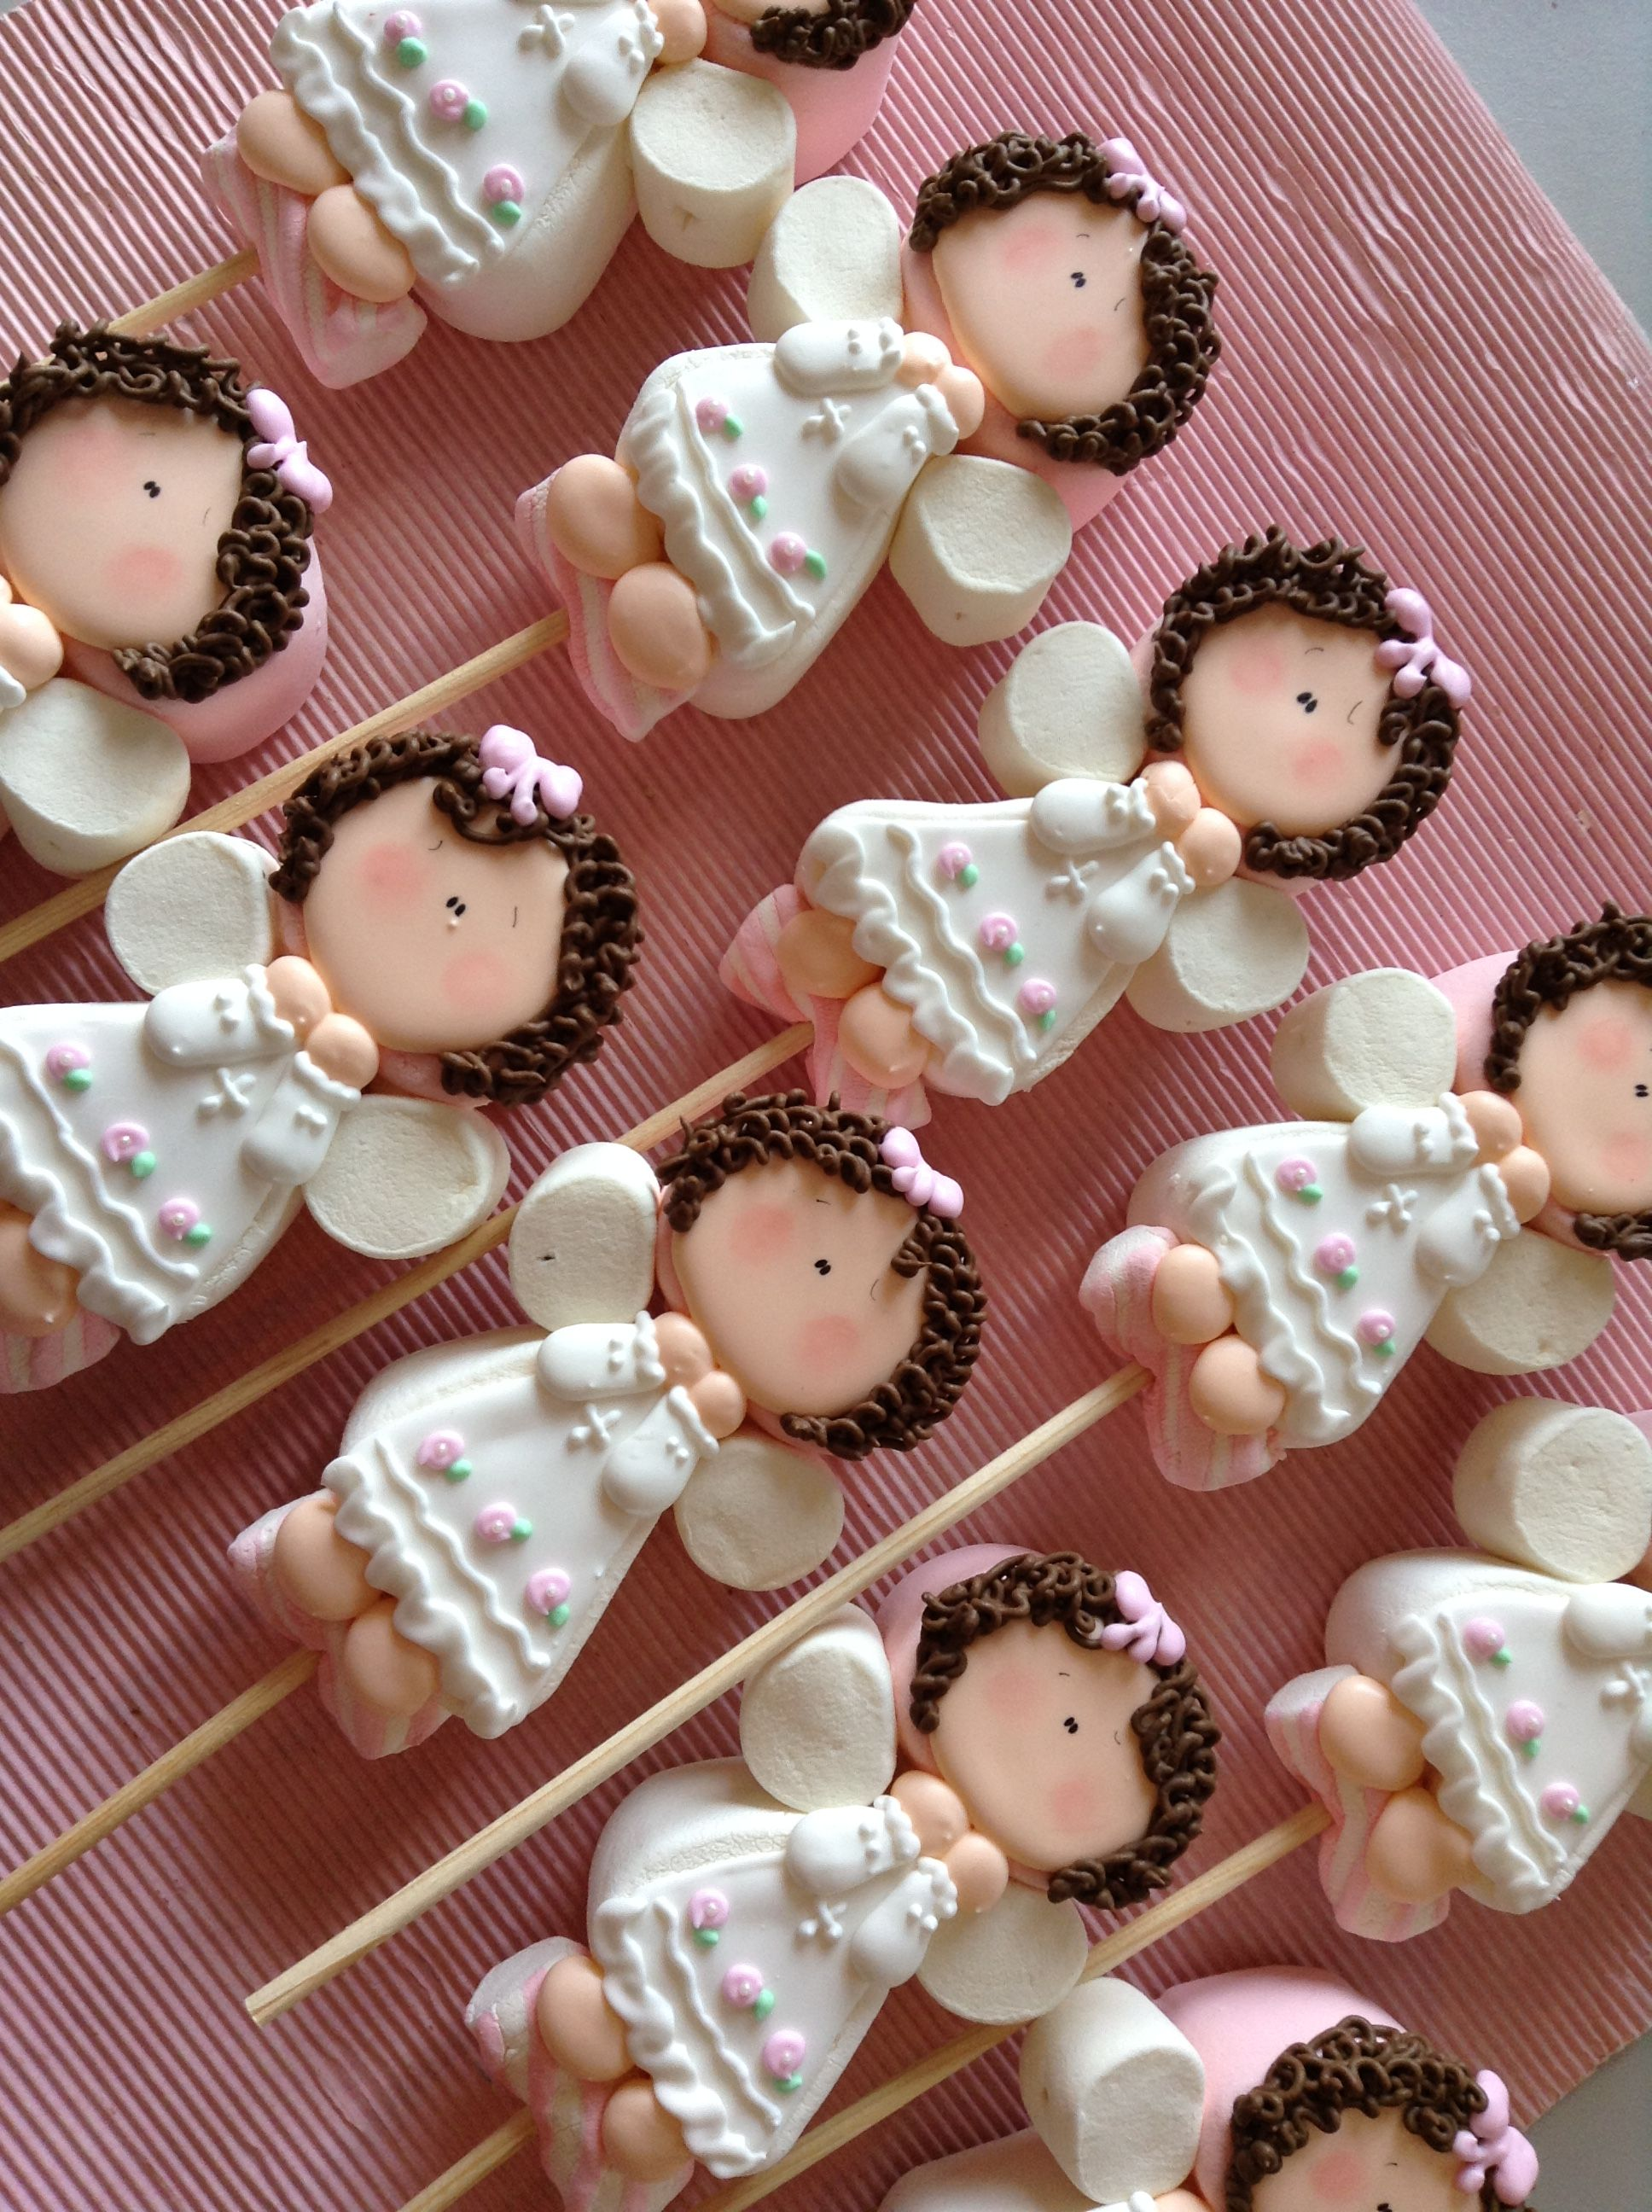 Pin by maria julia vargas arias on Figuras con marmelos | Pinterest ...